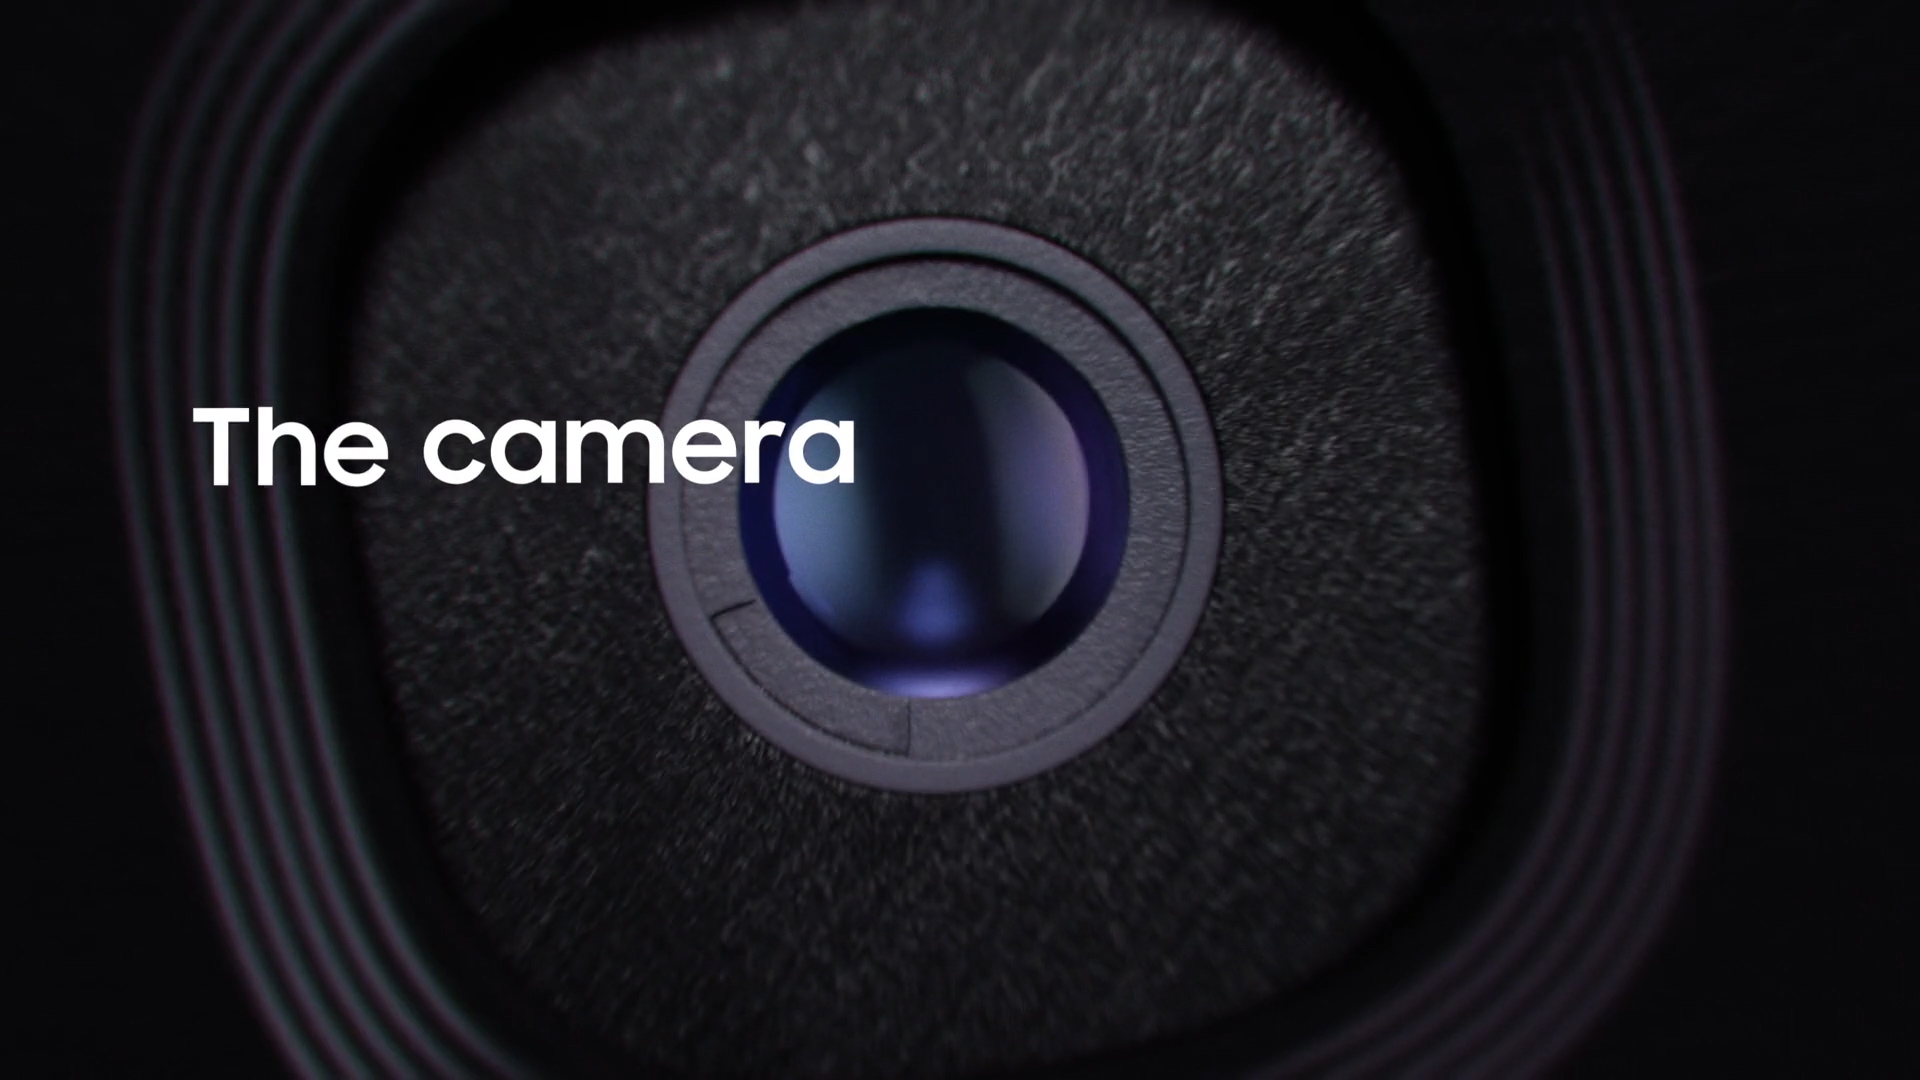 Houdini work on Samsung Galaxy S9 camera